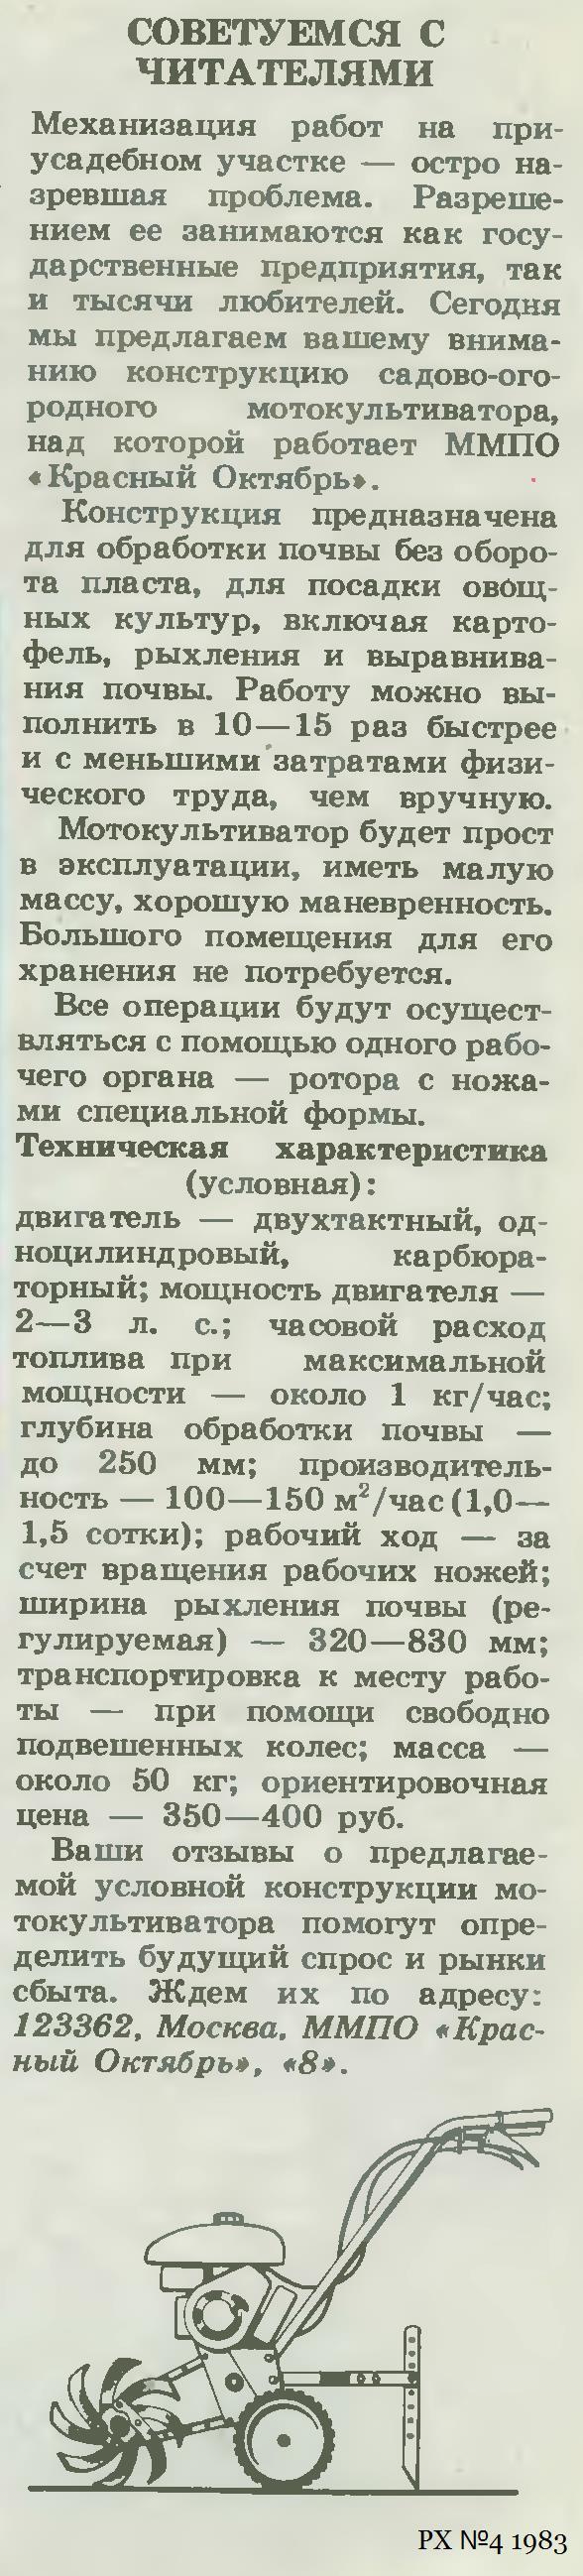 http://s7.uploads.ru/iNAvz.jpg